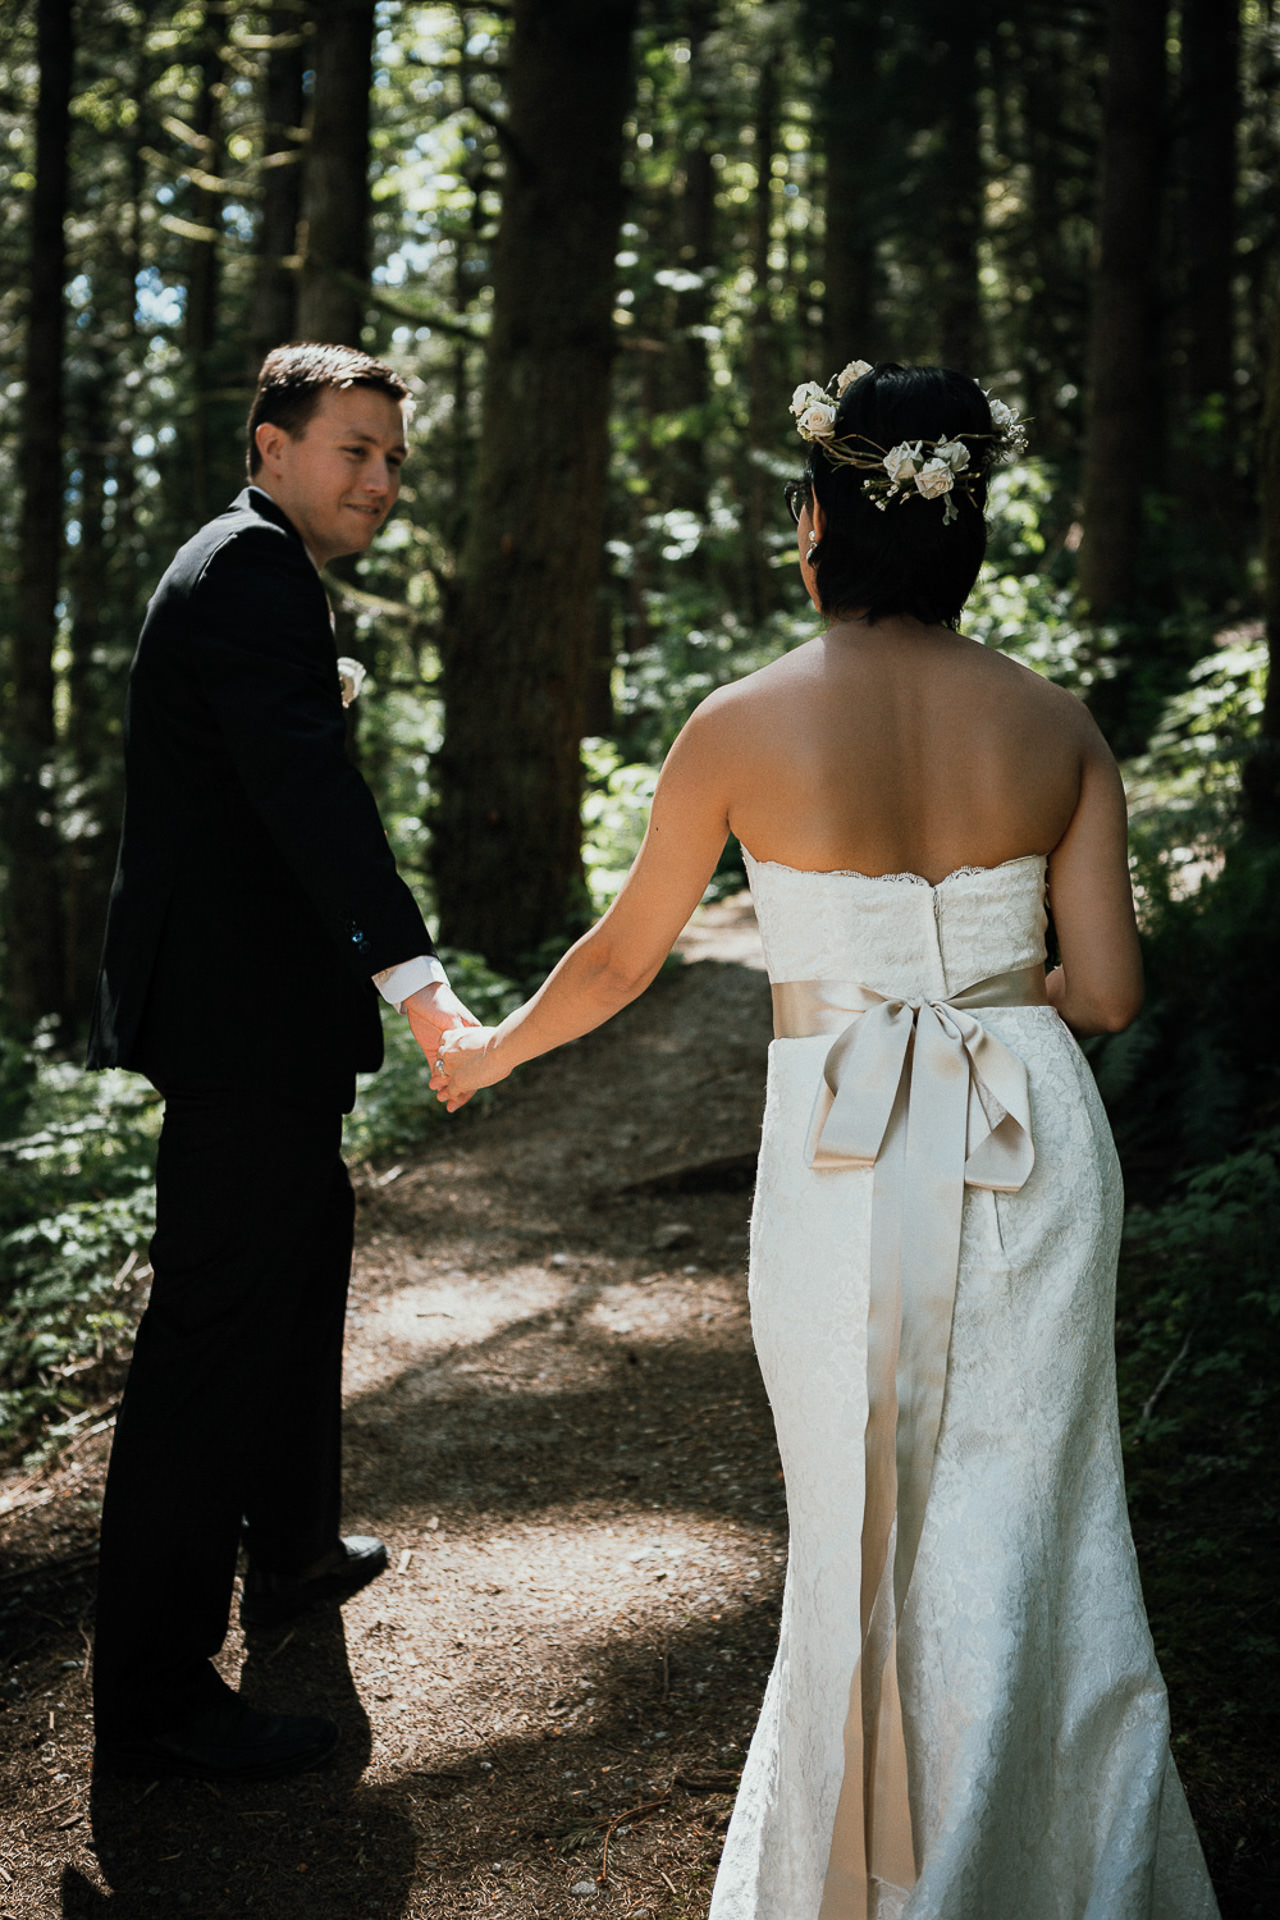 Nadine-Hansen-Photography-Vancouver-Cleveland-Dam-Wedding-7.jpg